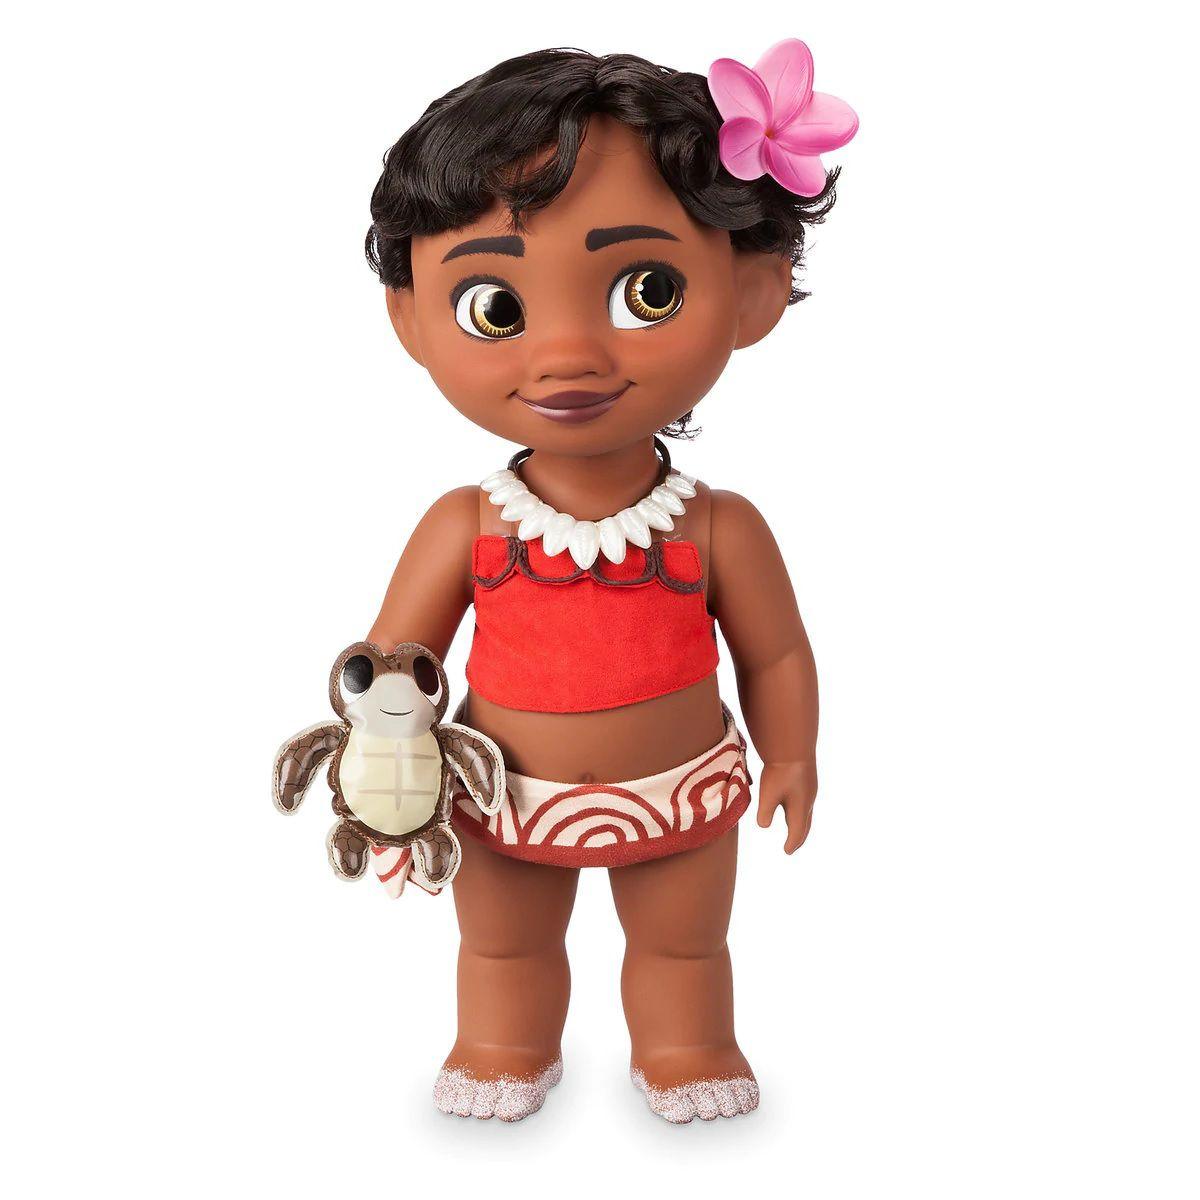 Boneca Moana: Moana Um Mar de Aventuras (Disney Animators' Collection) - Disney